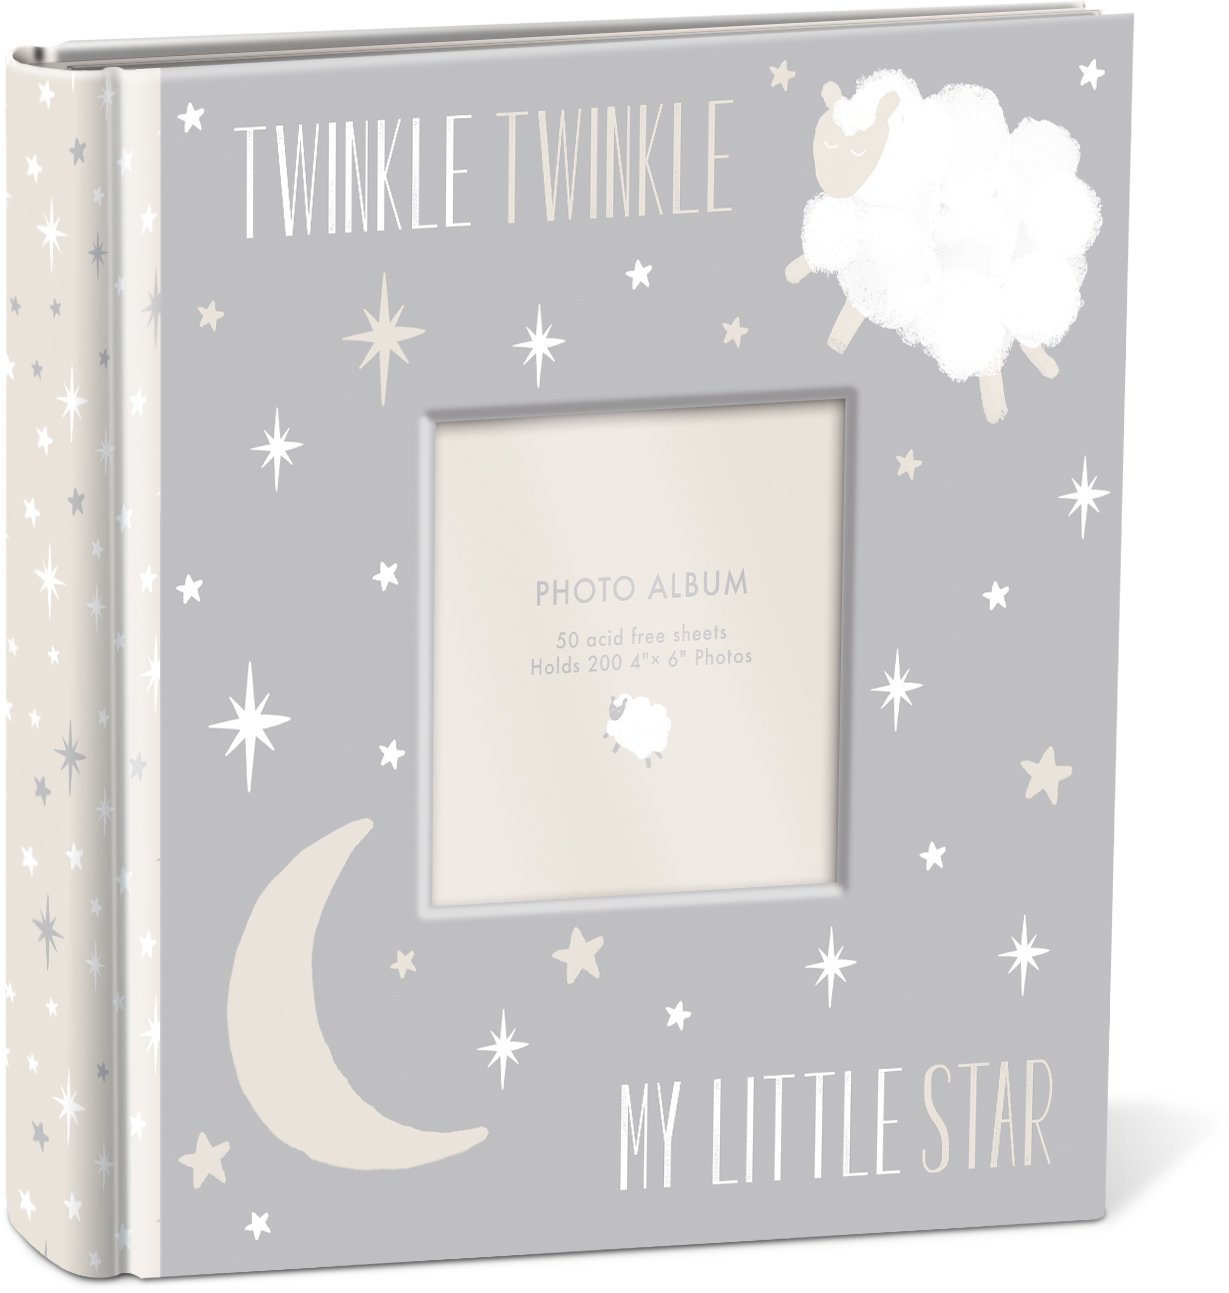 Punch Studio Twinkle Twinkle Photo Album by Lady Jayne (Image #1)